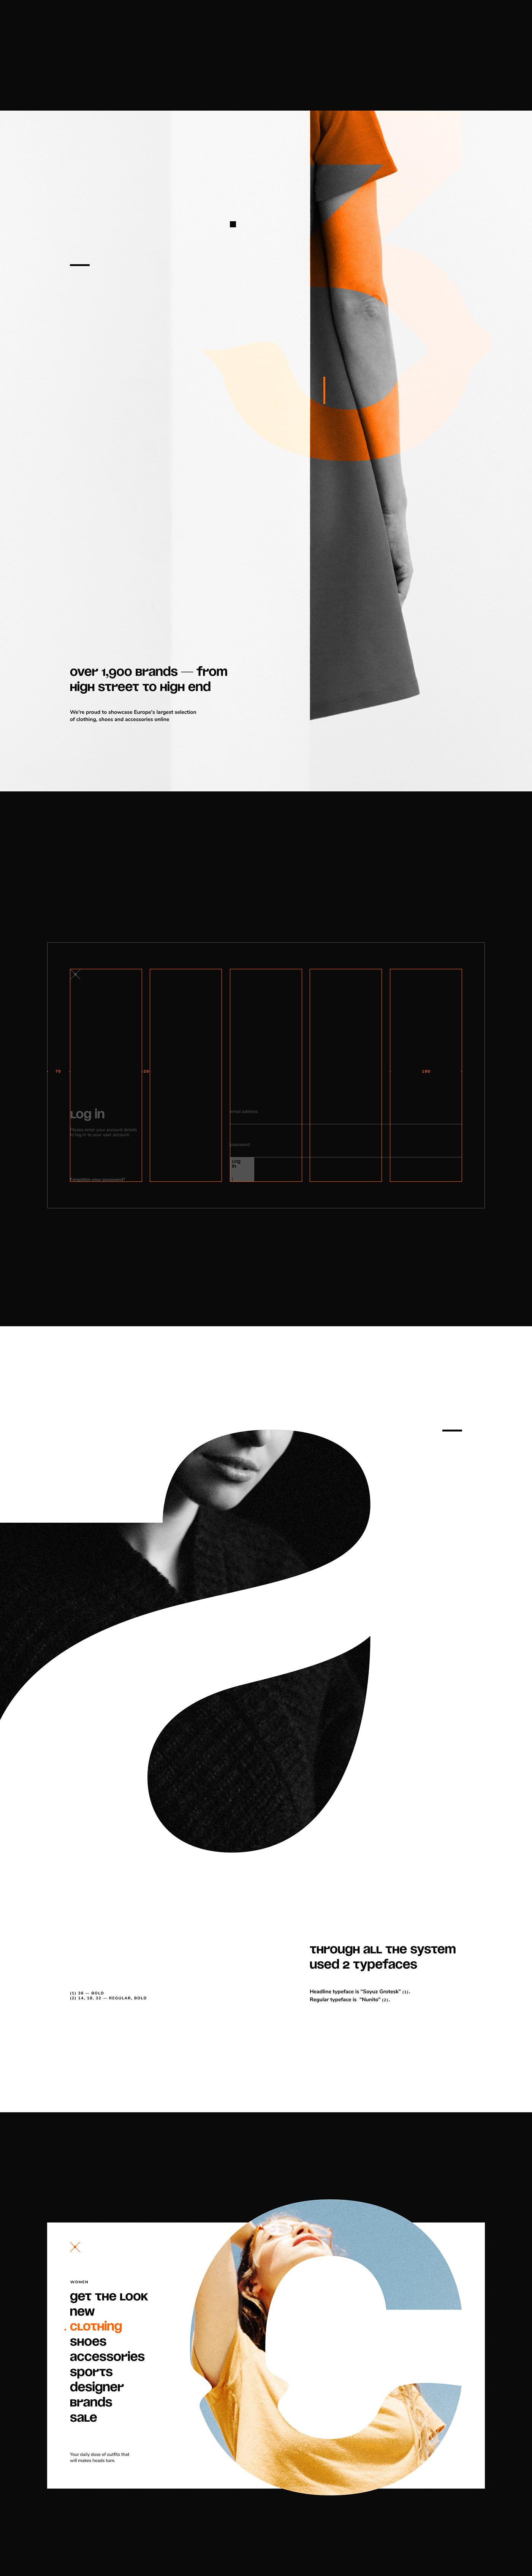 zalando,store,trands,Fashion ,redesign,design,Clothing,glases,typography  ,dress